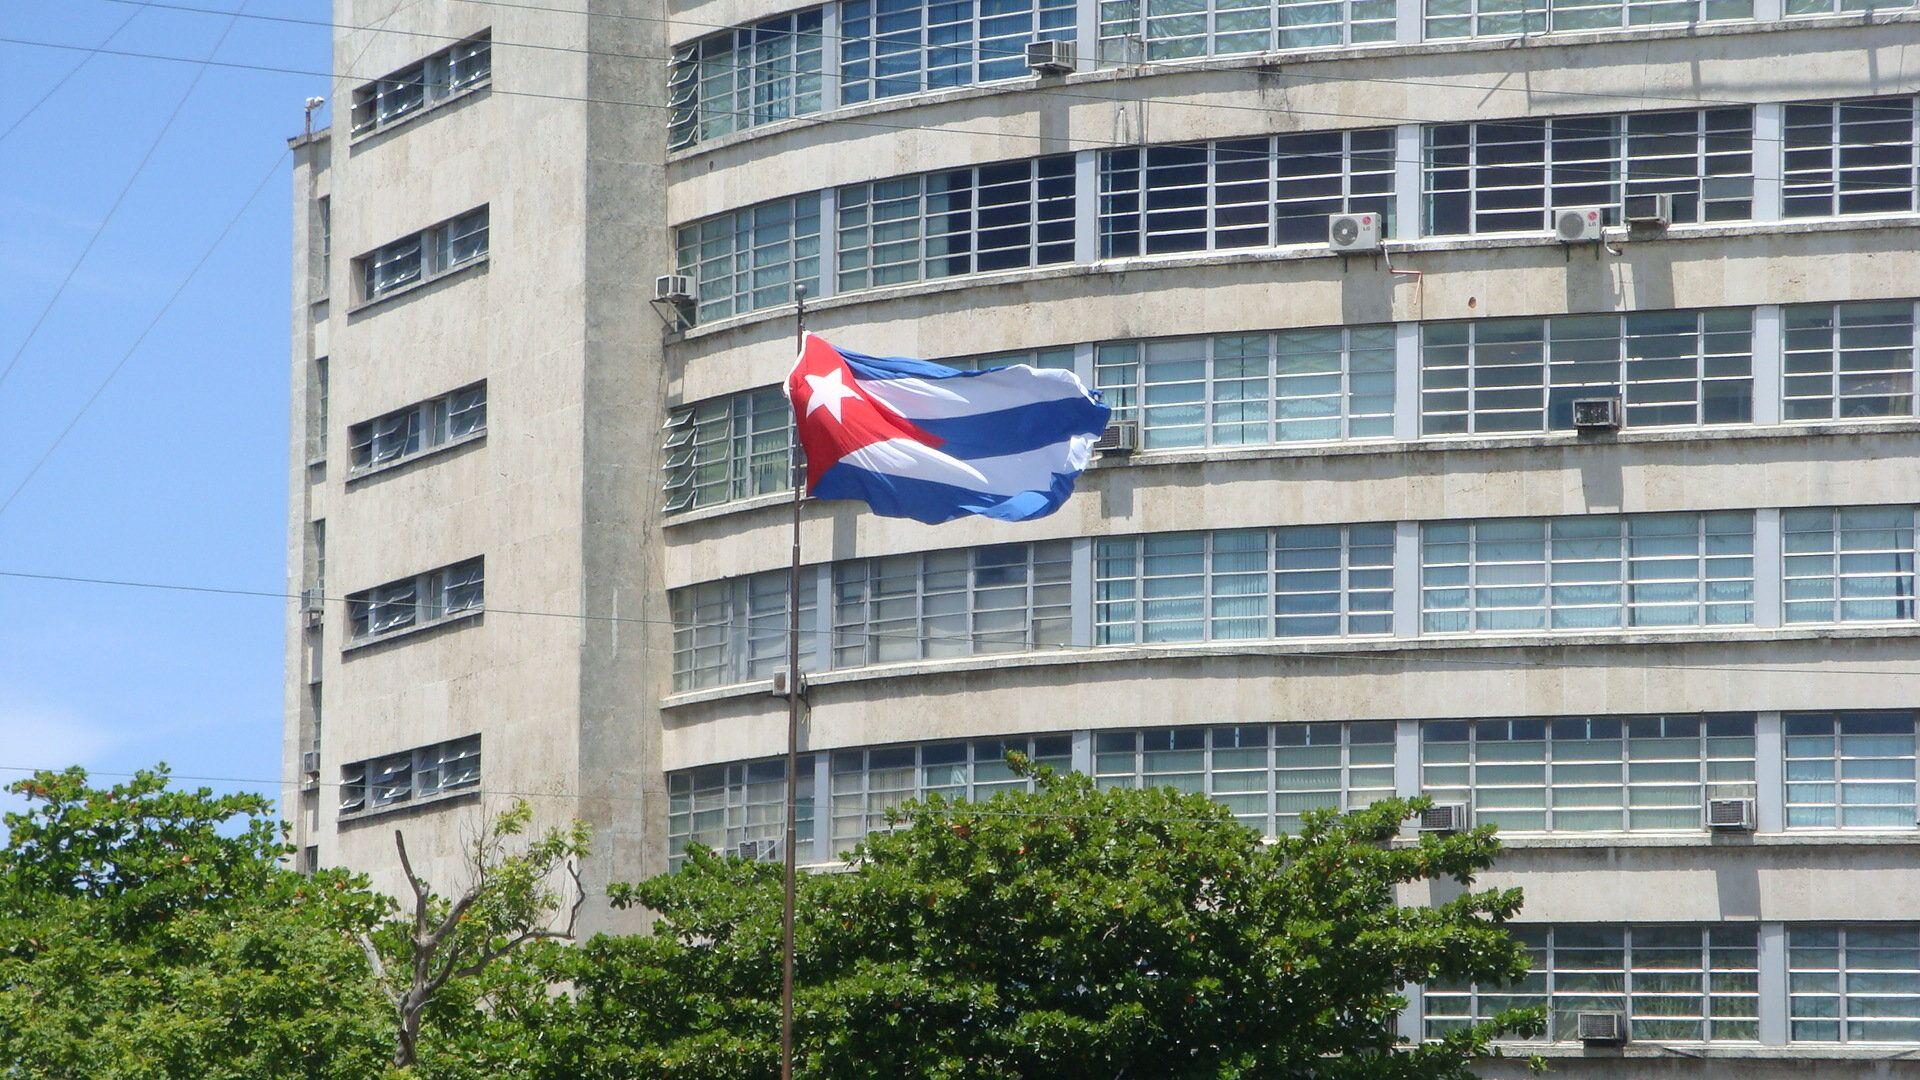 La bandiera cubana - Sputnik Italia, 1920, 12.07.2021